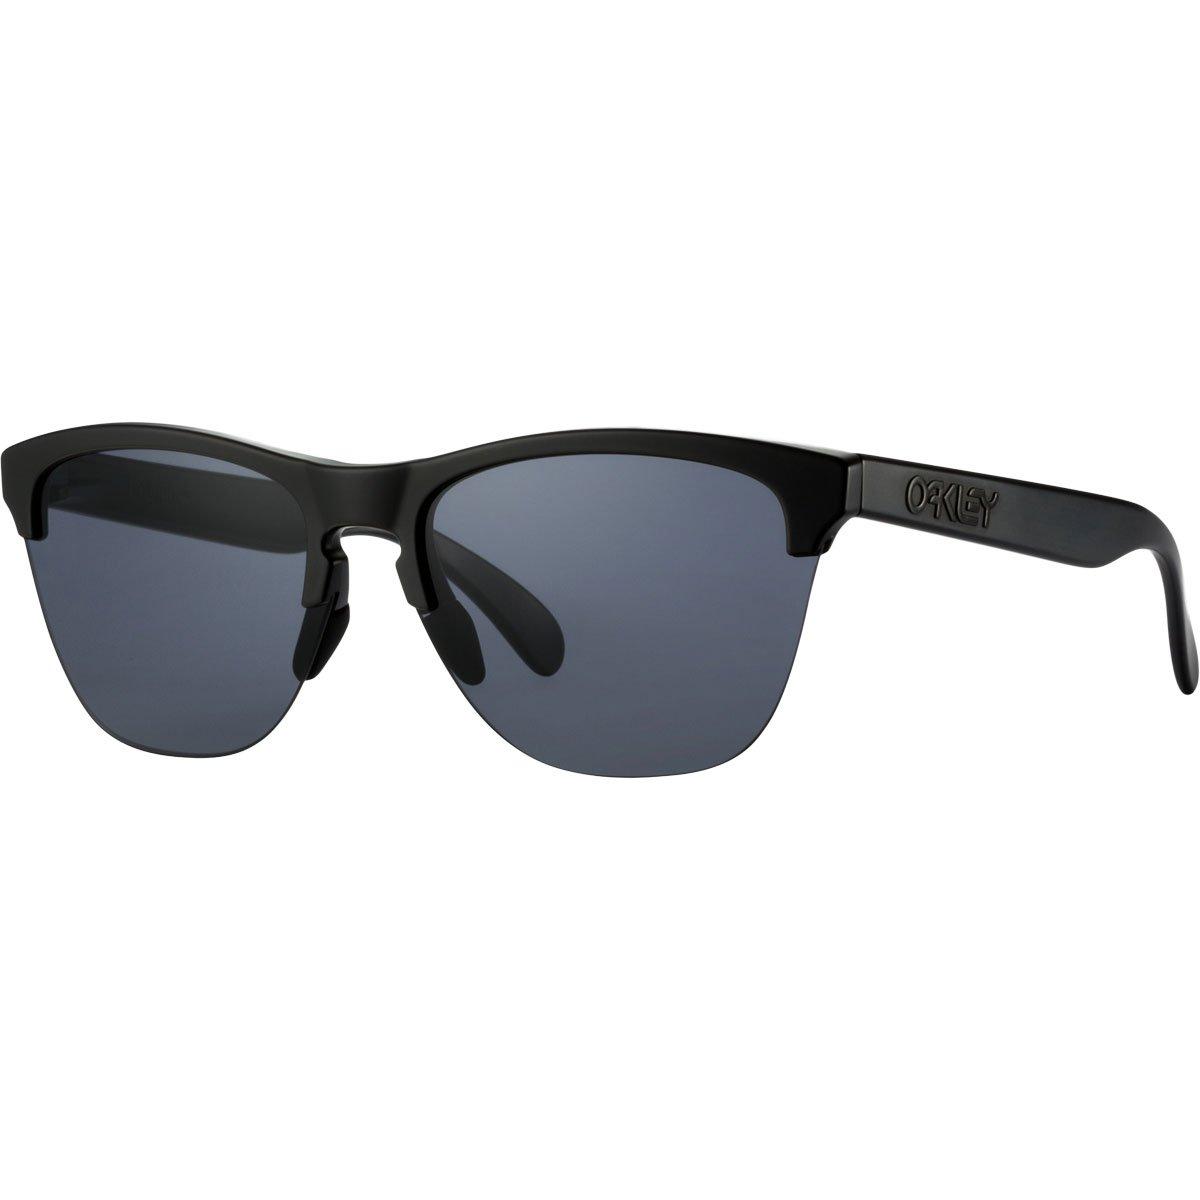 Oakley 0OO9374 Gafas de Sol, Hombre, Matte Black, 63